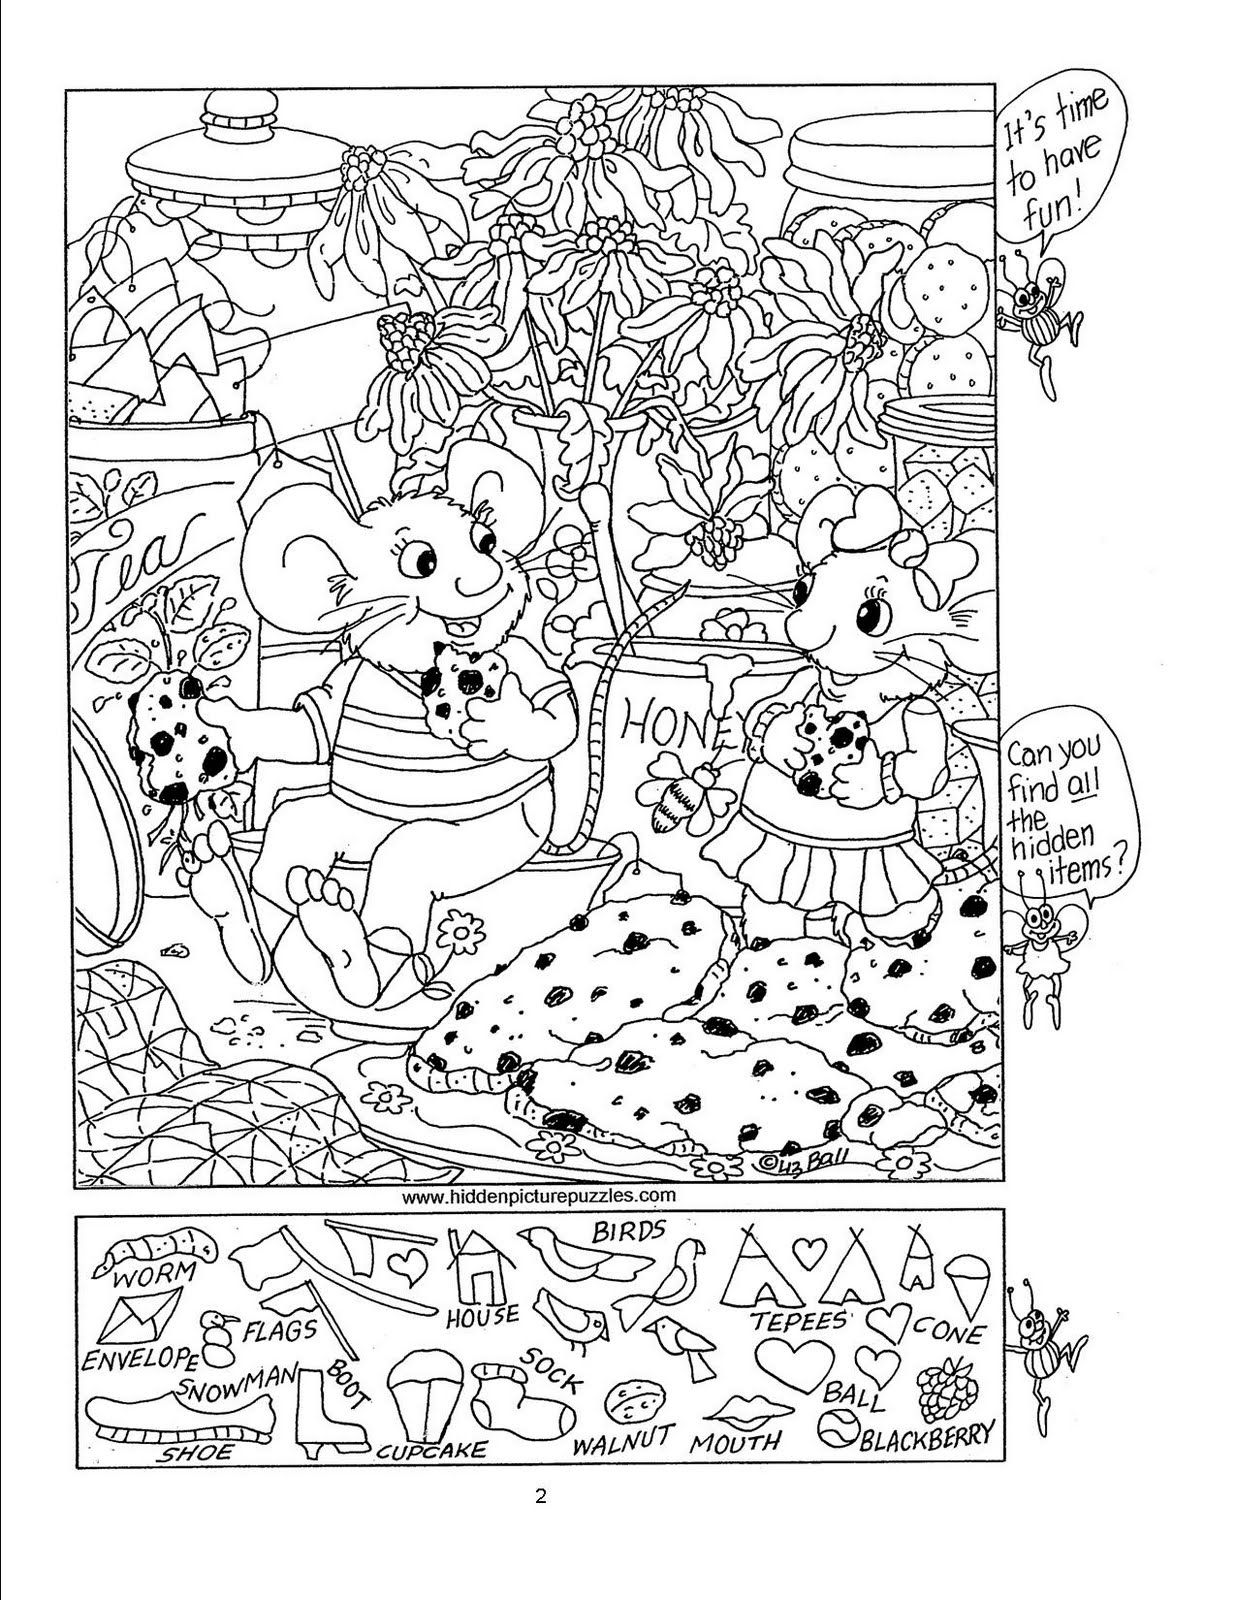 Worksheets Free Printable Hidden Picture Worksheets 7 places to find free hidden picture puzzles for kids